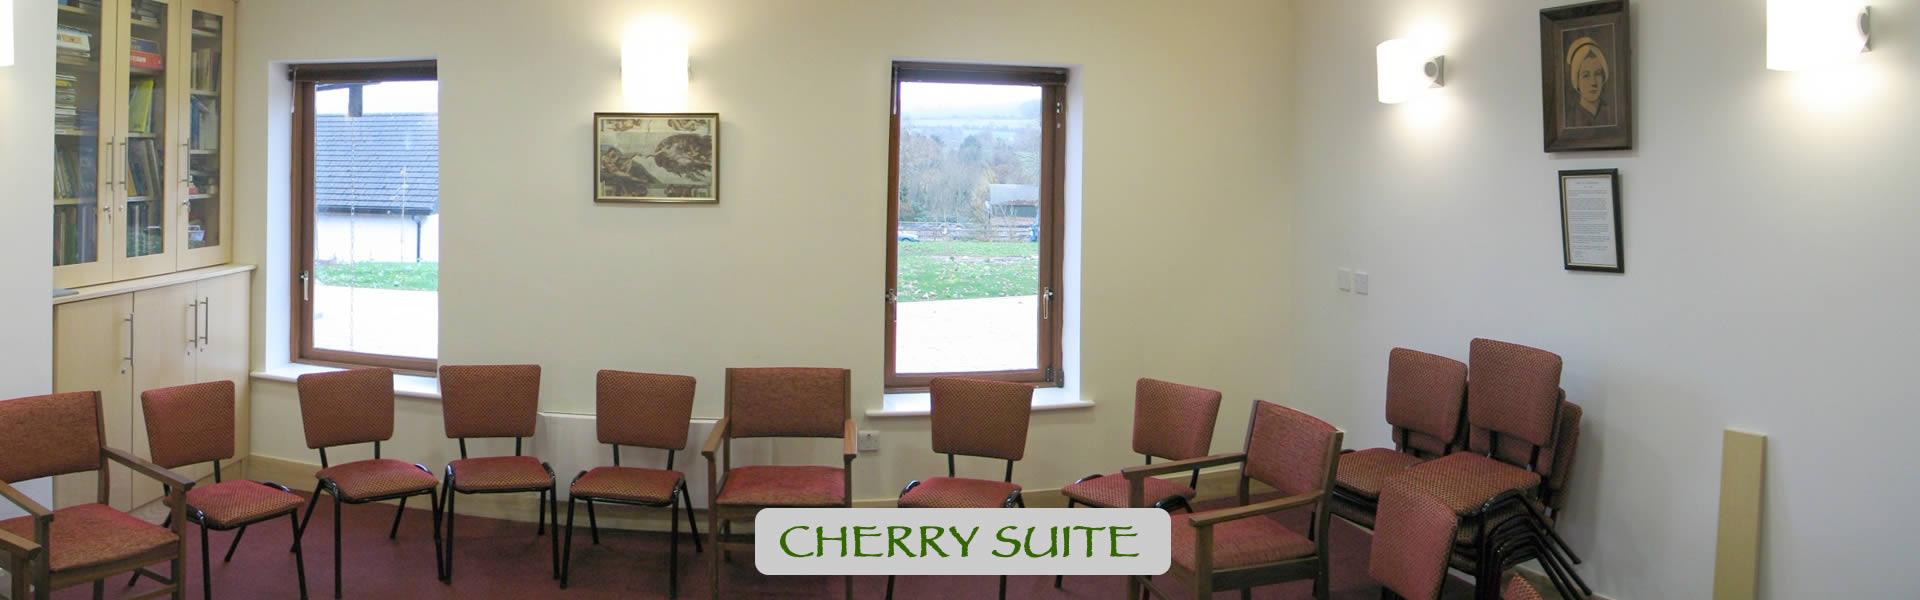 Cherry Suite